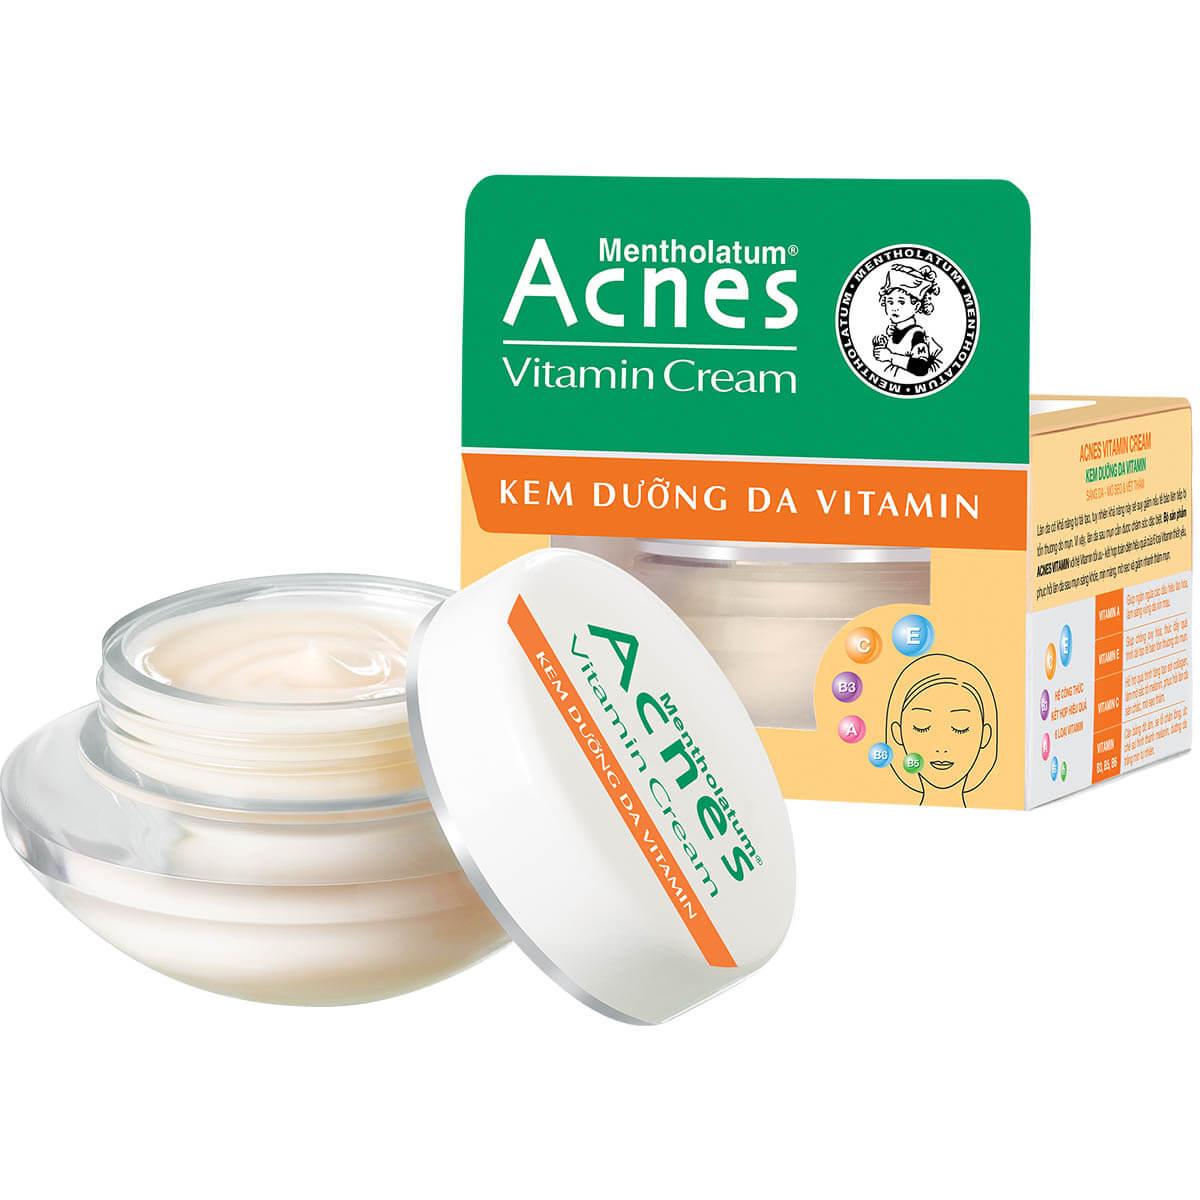 kem duong da acnes vitamin cream voi cac chat vitamin va duong chat giup nuoi duong, phuc hoi lan da khoe manh sau khi dieu tri mun